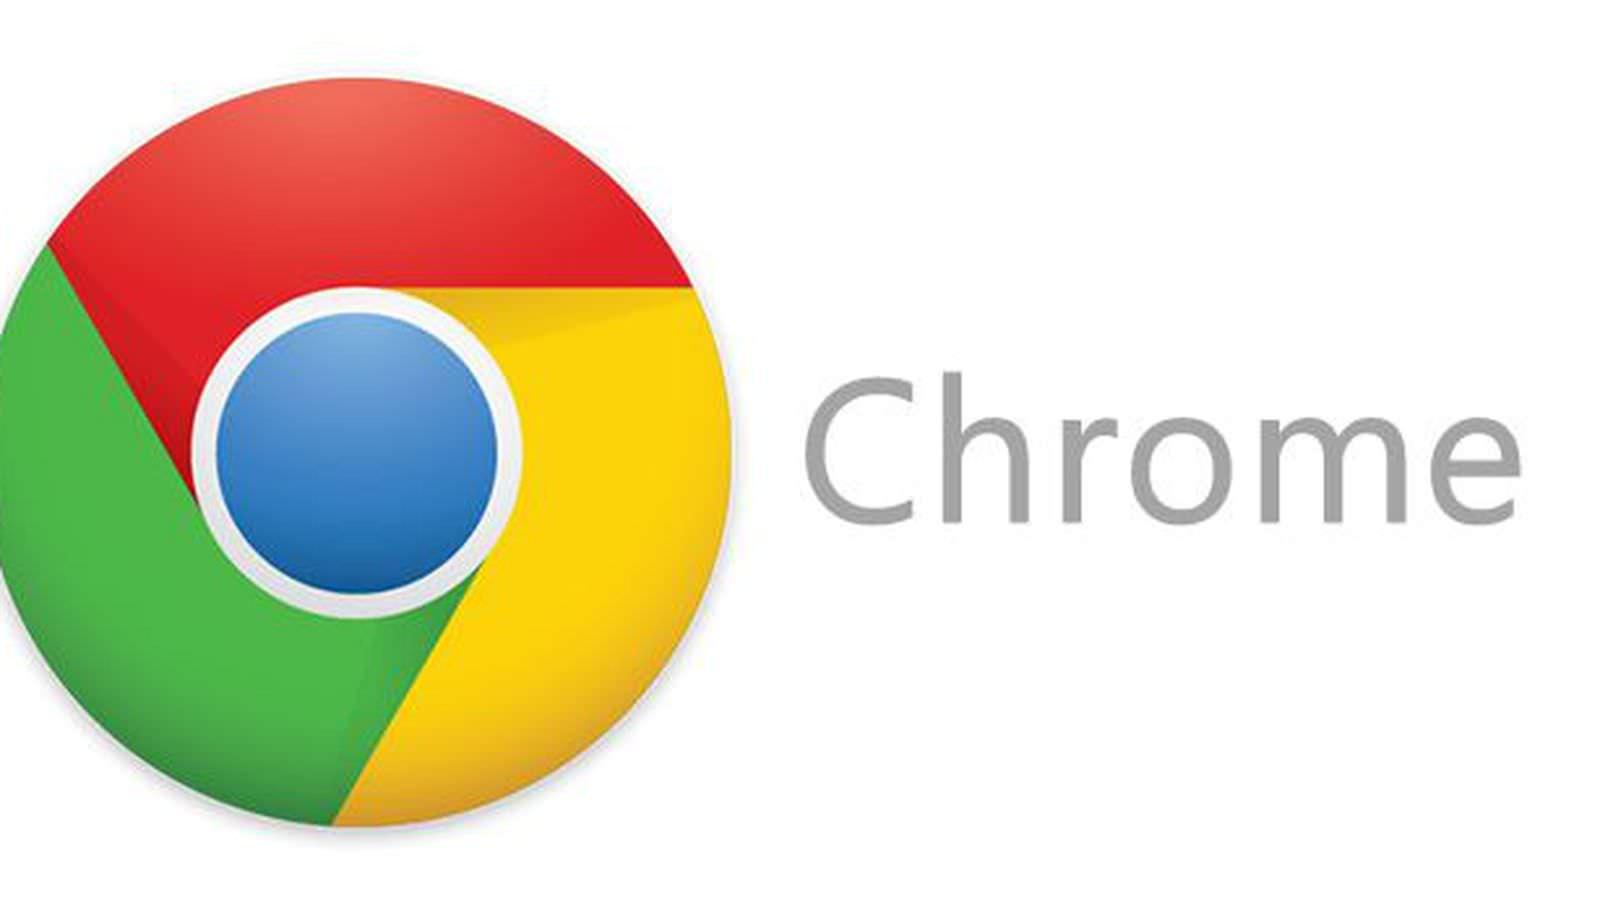 Chrome68がリリース!httpの警告表示は?他のブラウザは?